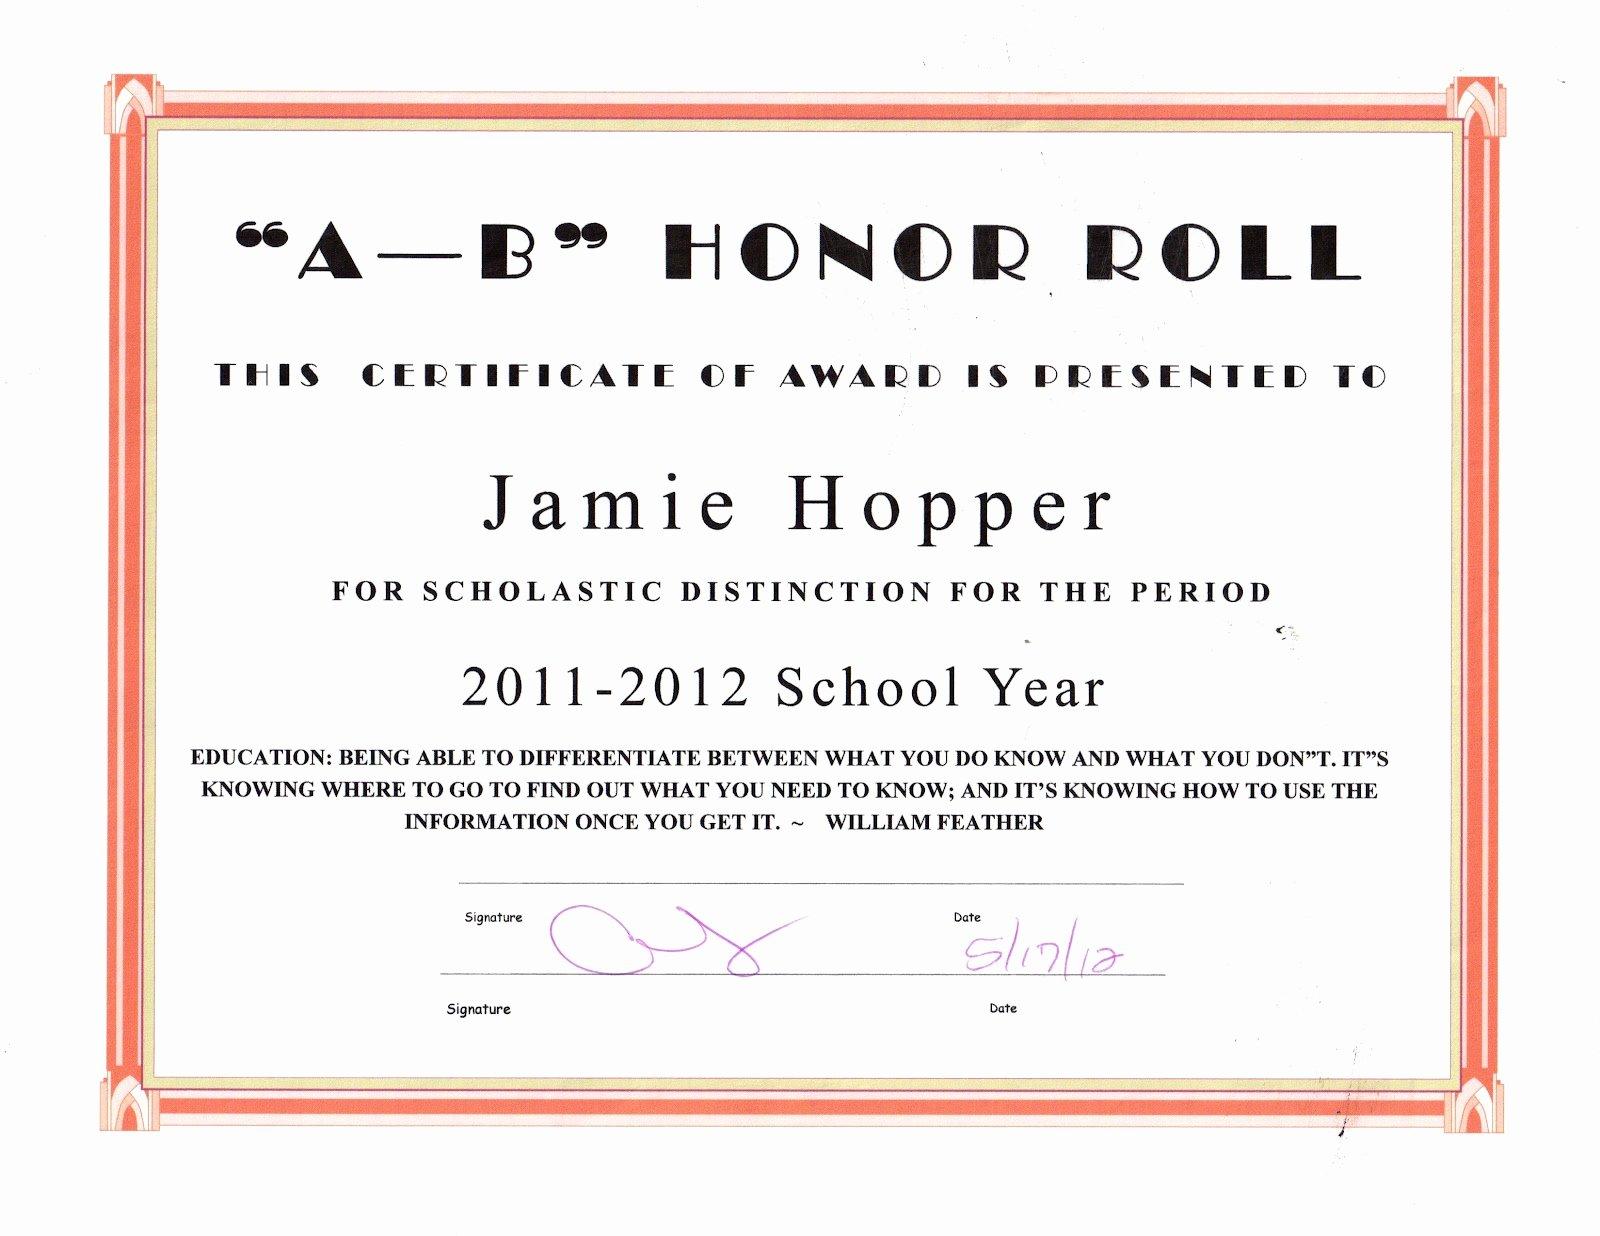 Honor Roll Certificate Template Unique the Jason Hopper Family June 2012